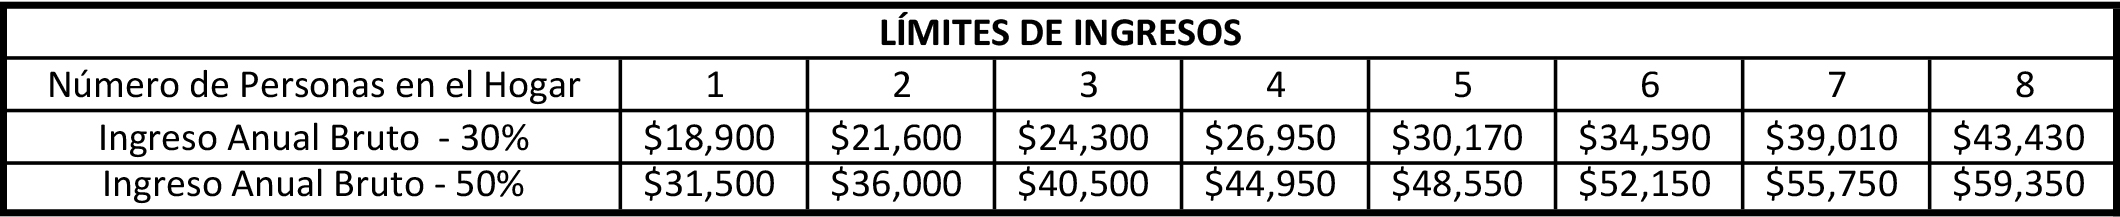 Income_Limits_2019_Spanish.jpg